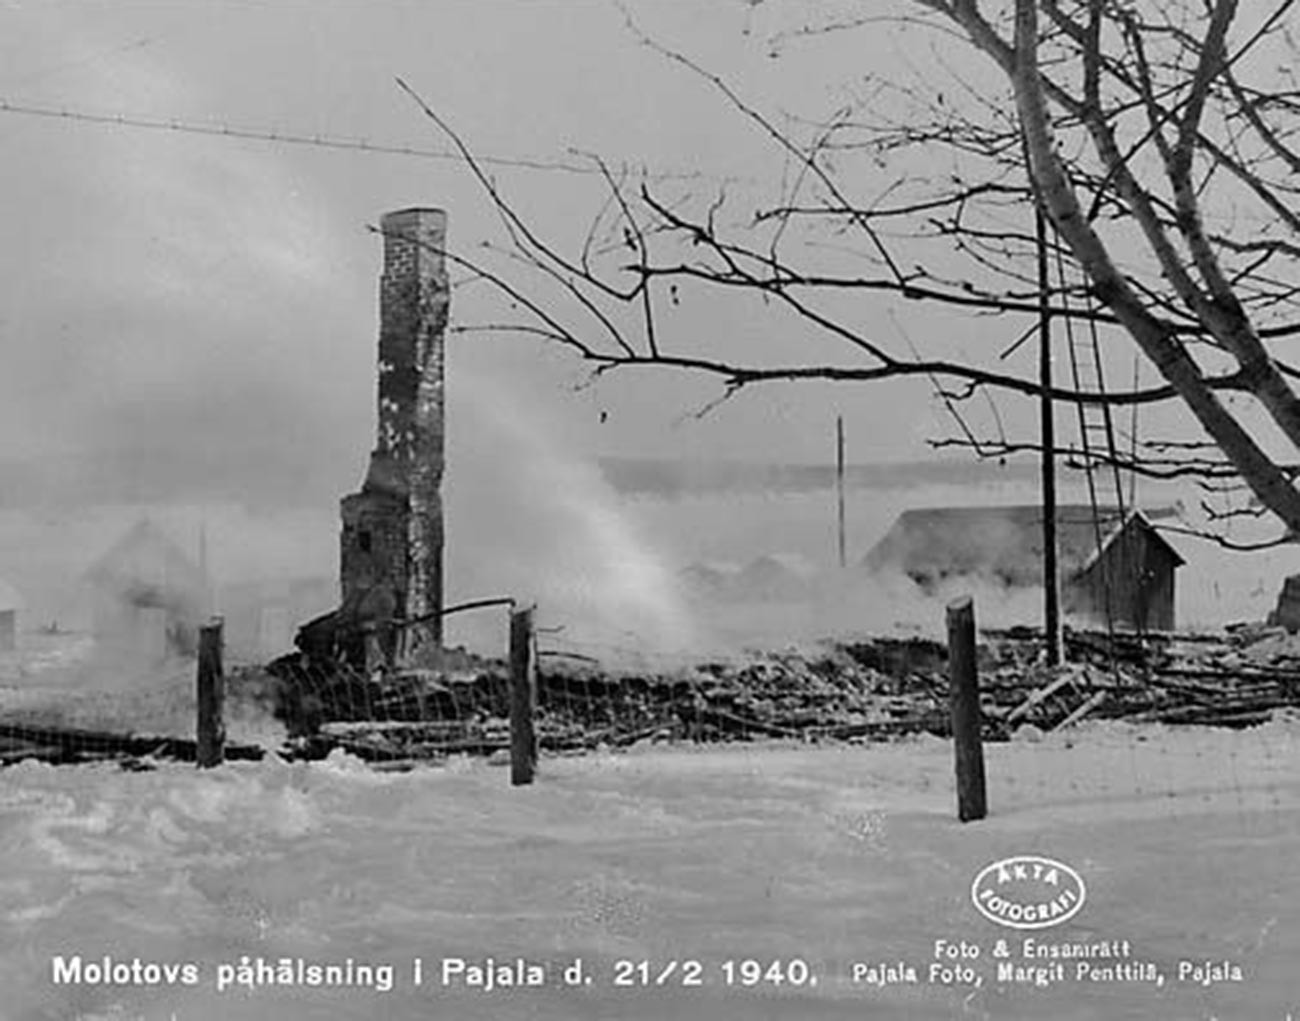 Le macerie a Pajala dopo il bombardamento sovietico